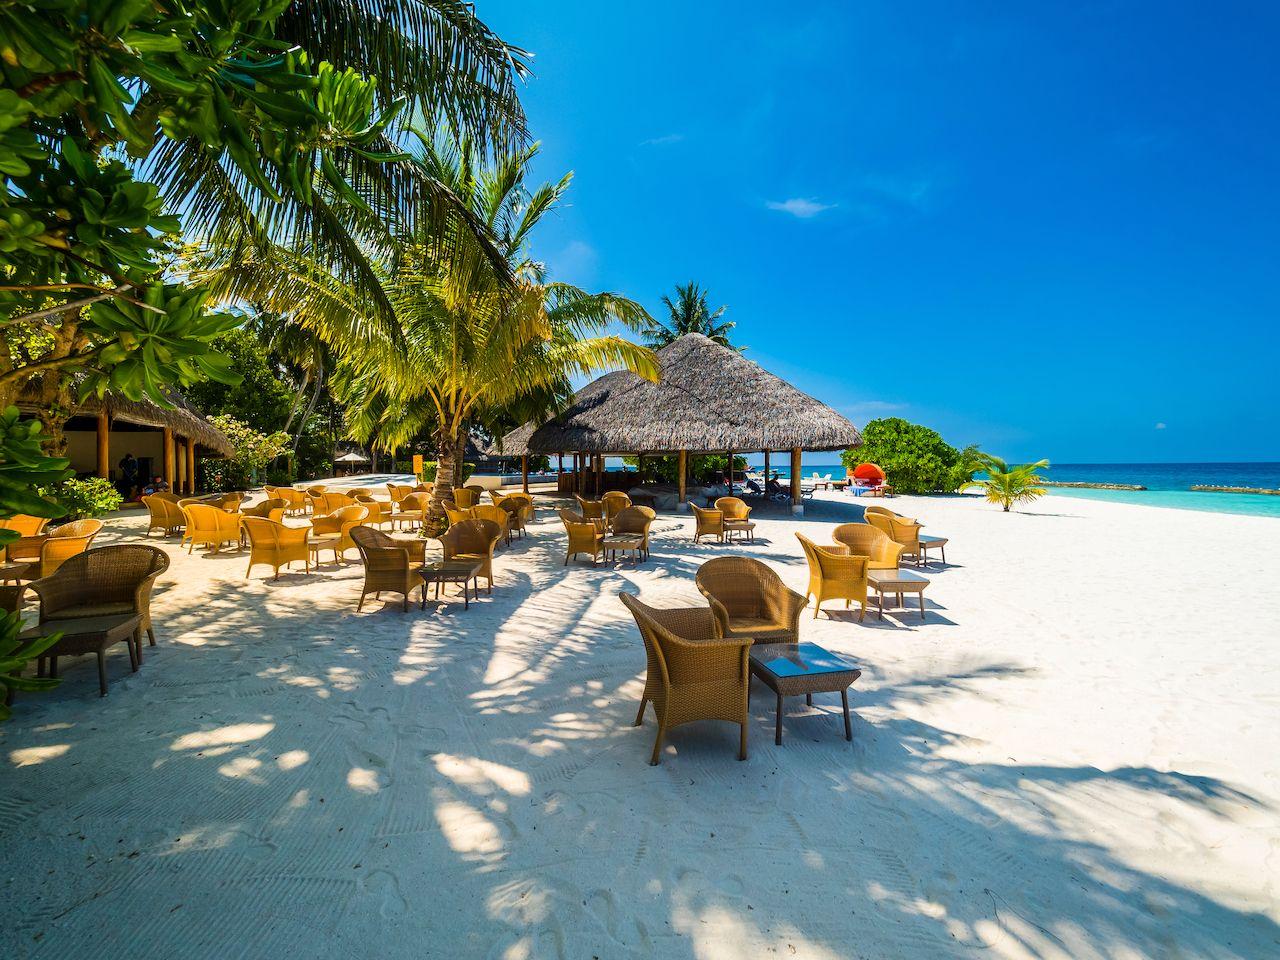 Maldives,Island,,Kuramathi,,Lagoon,,Rasdhoo,Atoll,,Maldives,,Mar,2018